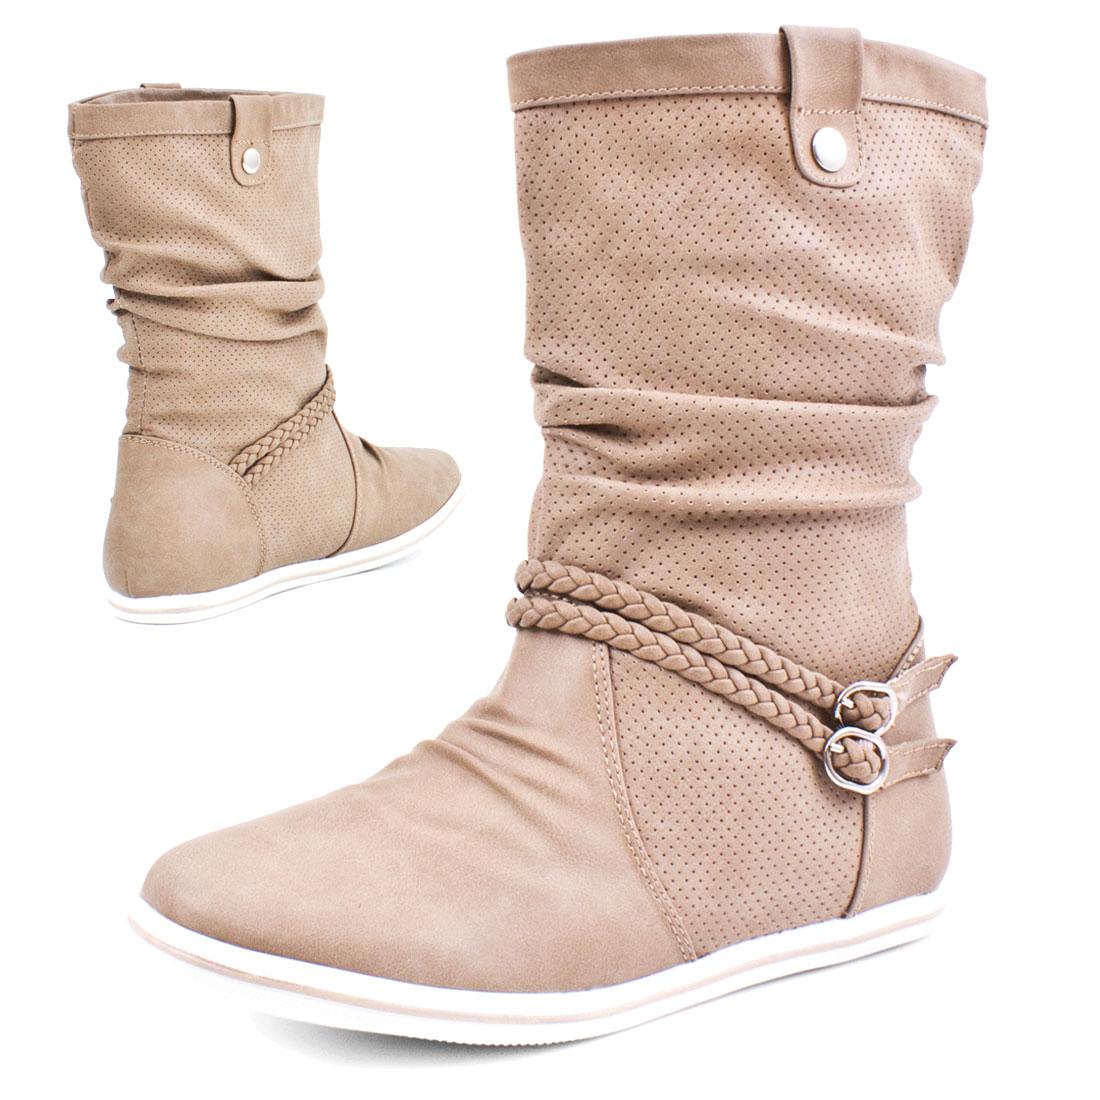 neu damen schlupf stiefel boots stiefeletten lederoptik schuhe 36 37 38 39 40 41 ebay. Black Bedroom Furniture Sets. Home Design Ideas